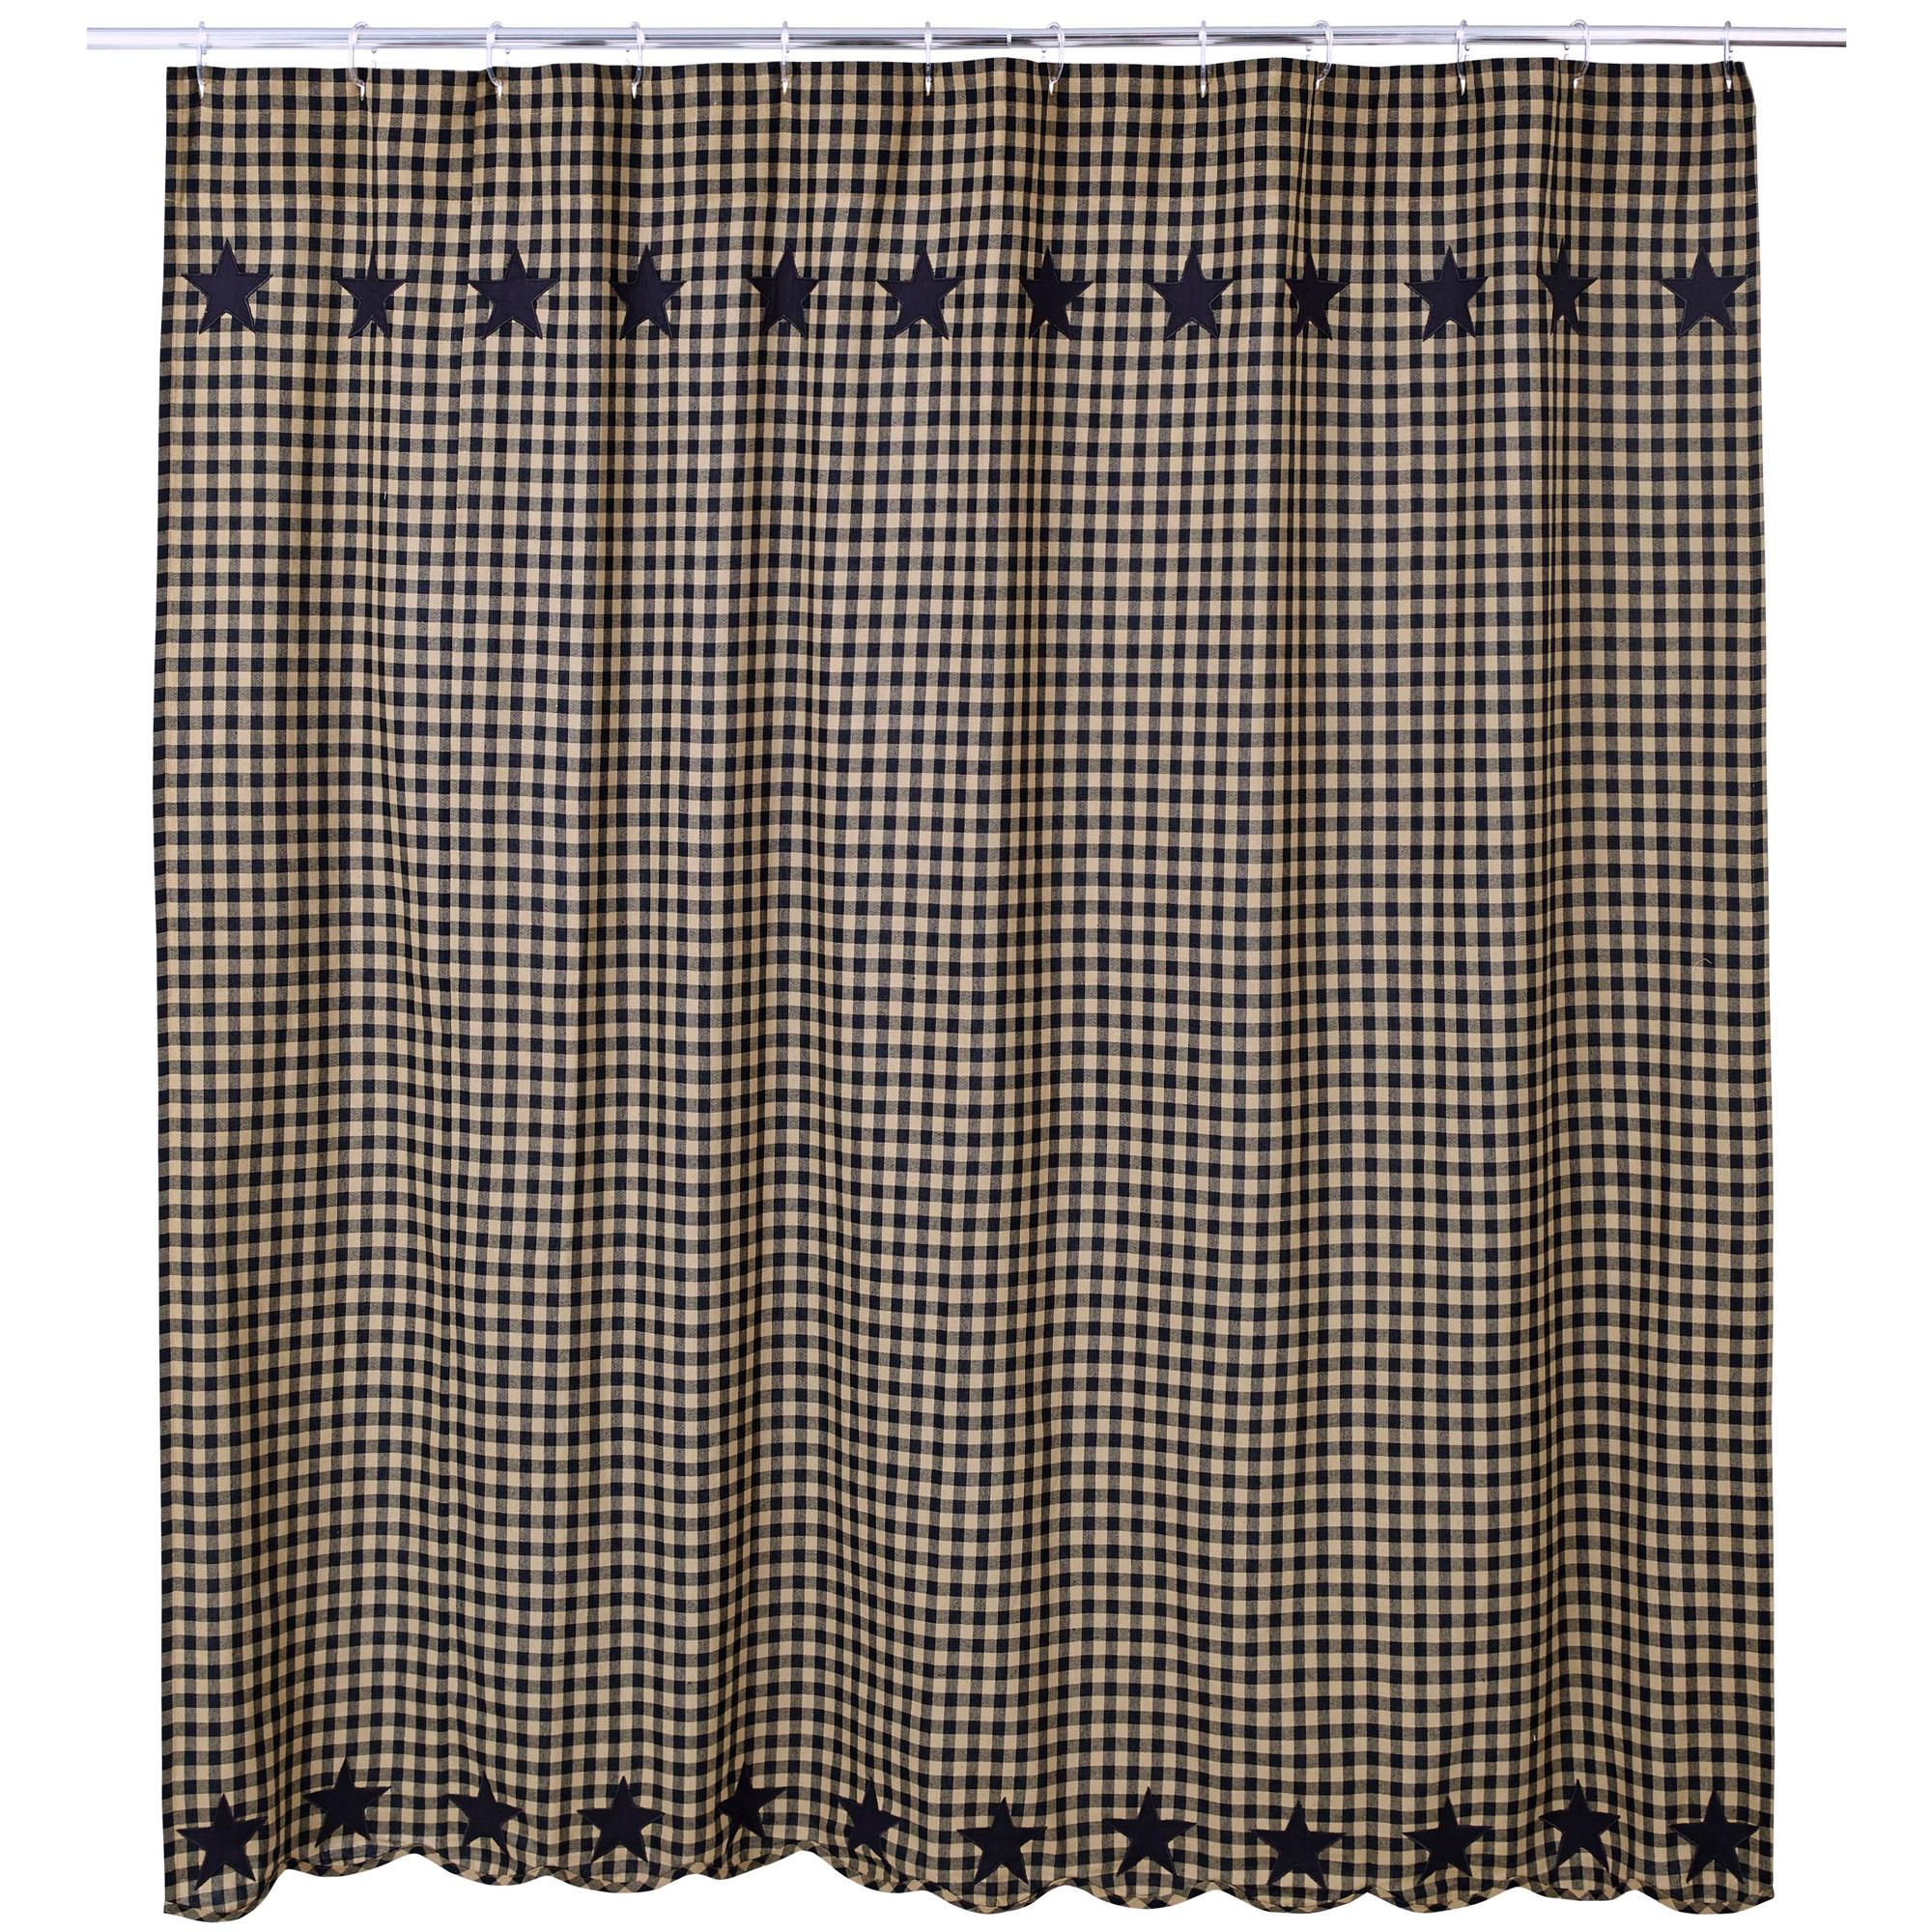 VHC Brands 20146 Black Star Shower Curtain 72x72 | eBay